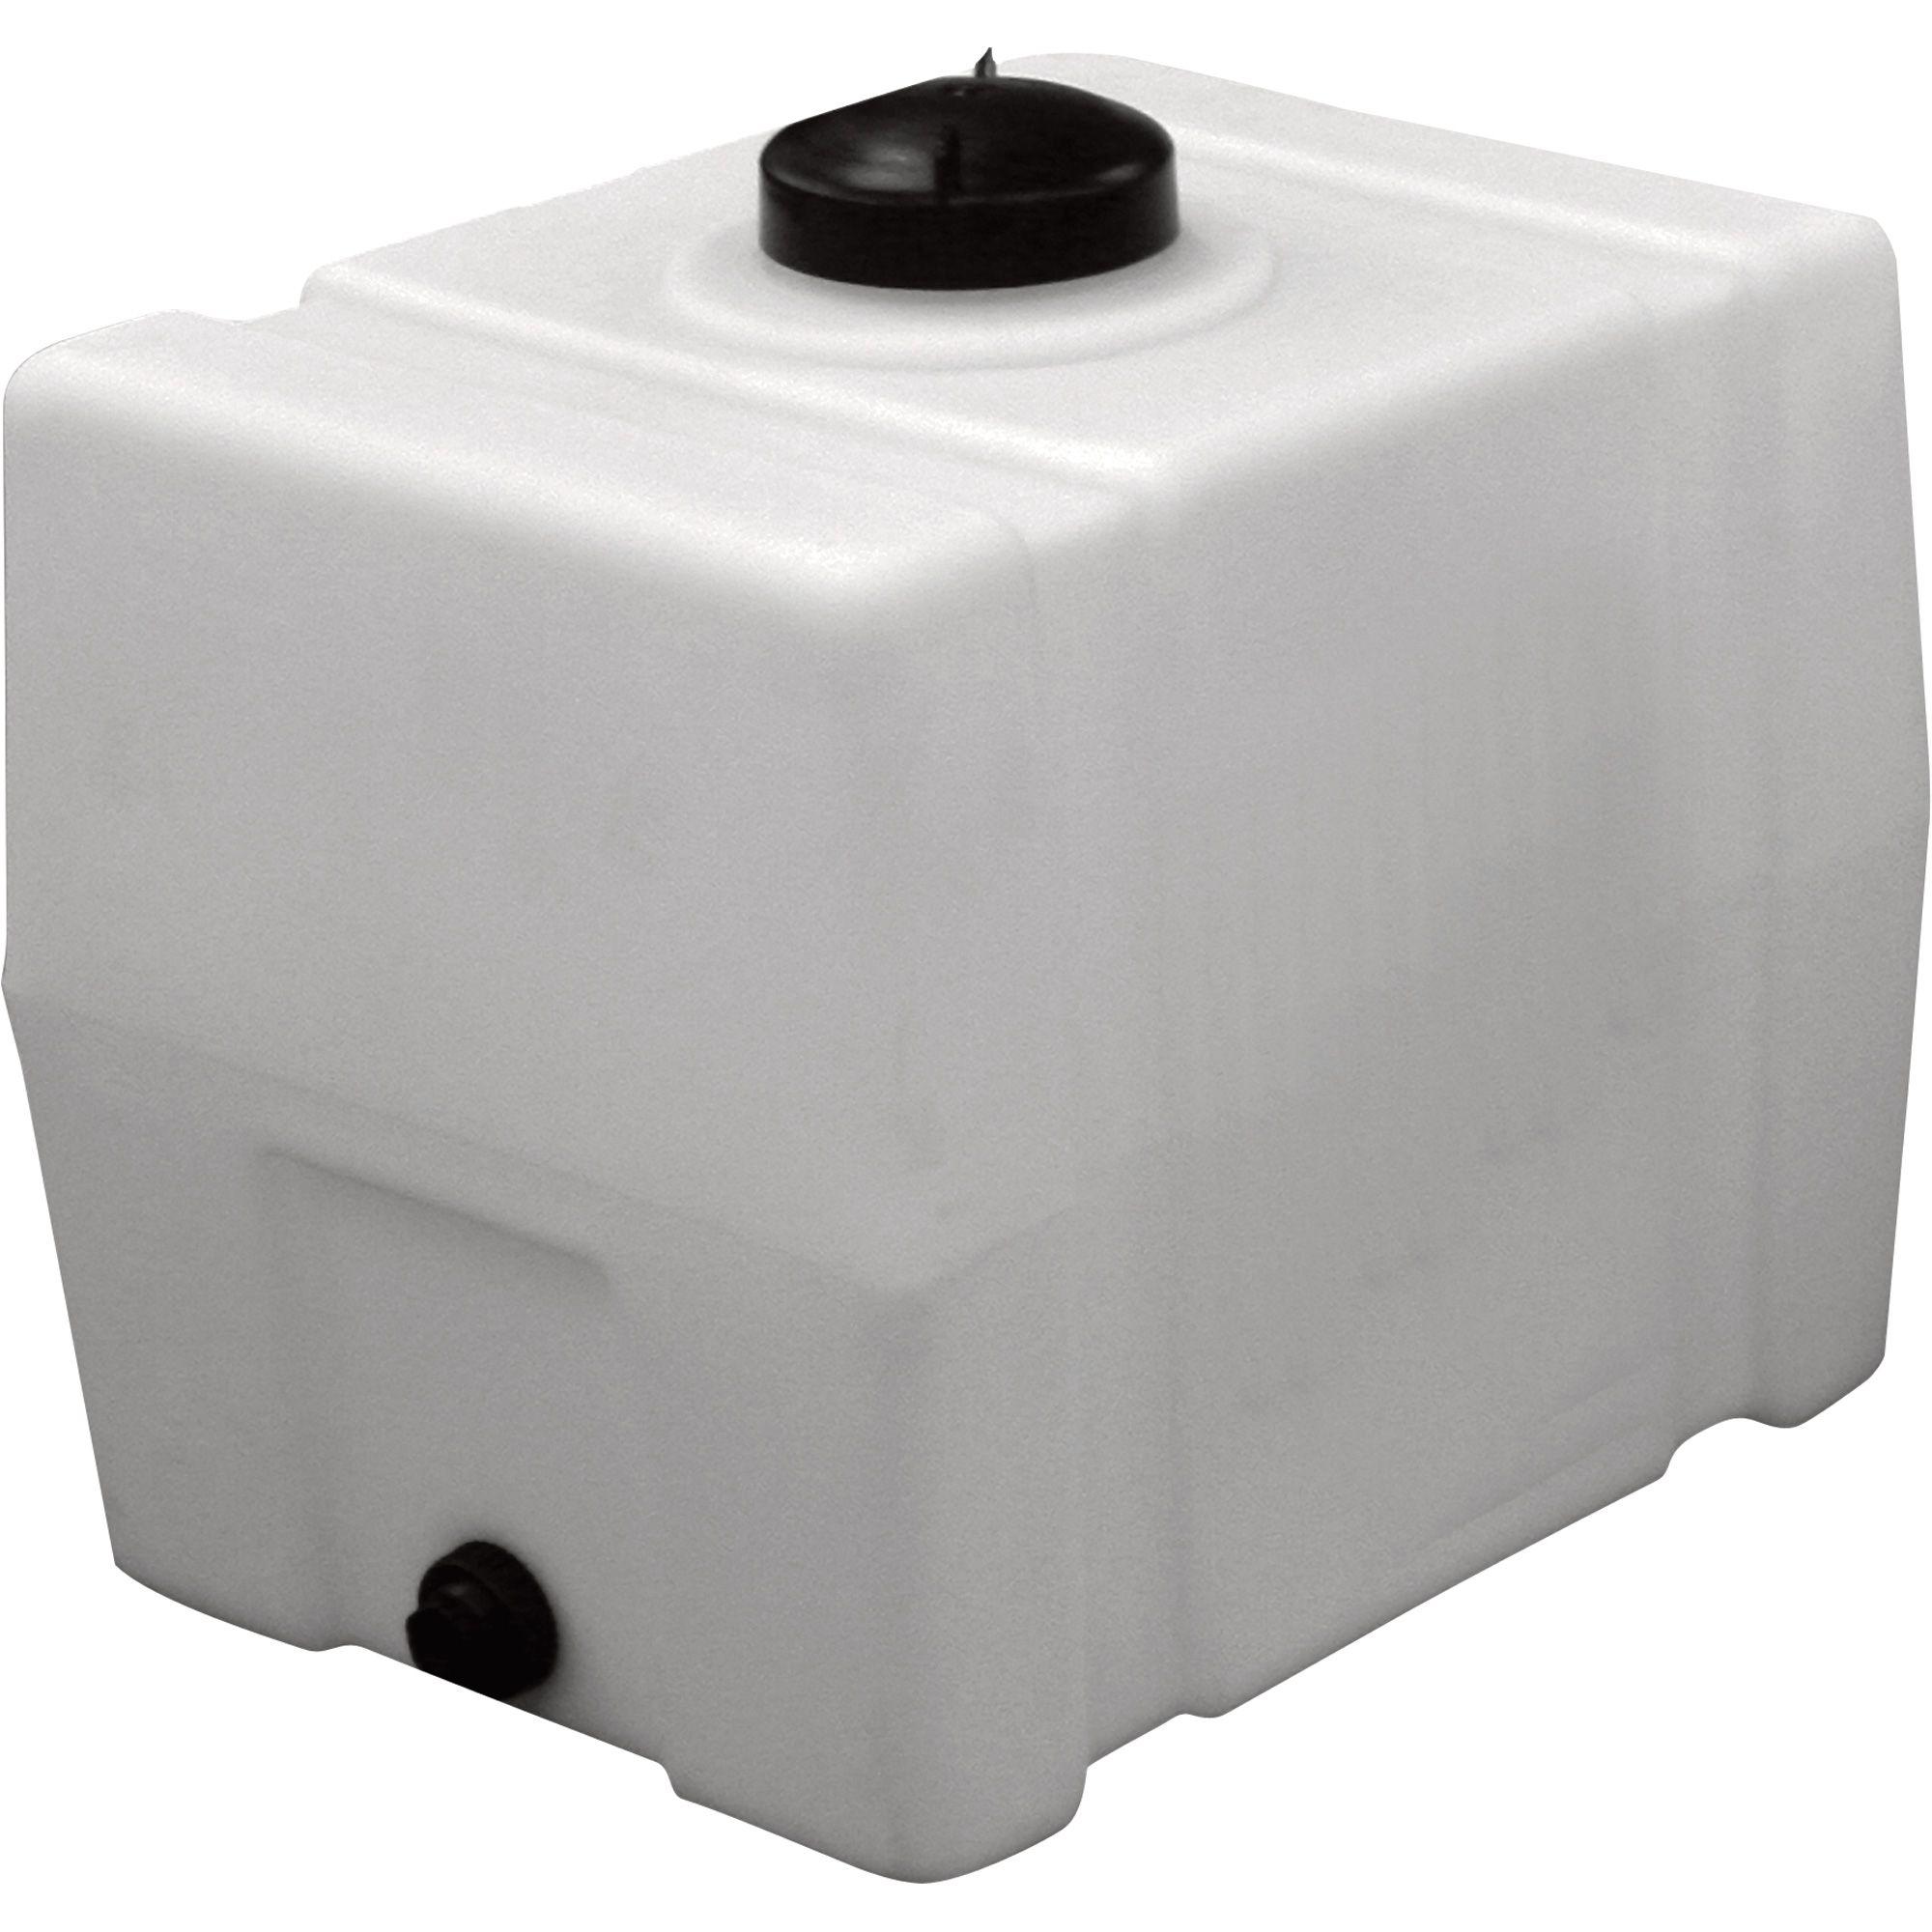 Romotech Poly Storage Tank Square 100 Gallon Capacity Model 2392 Storage Tank Storage Tanks Water Storage